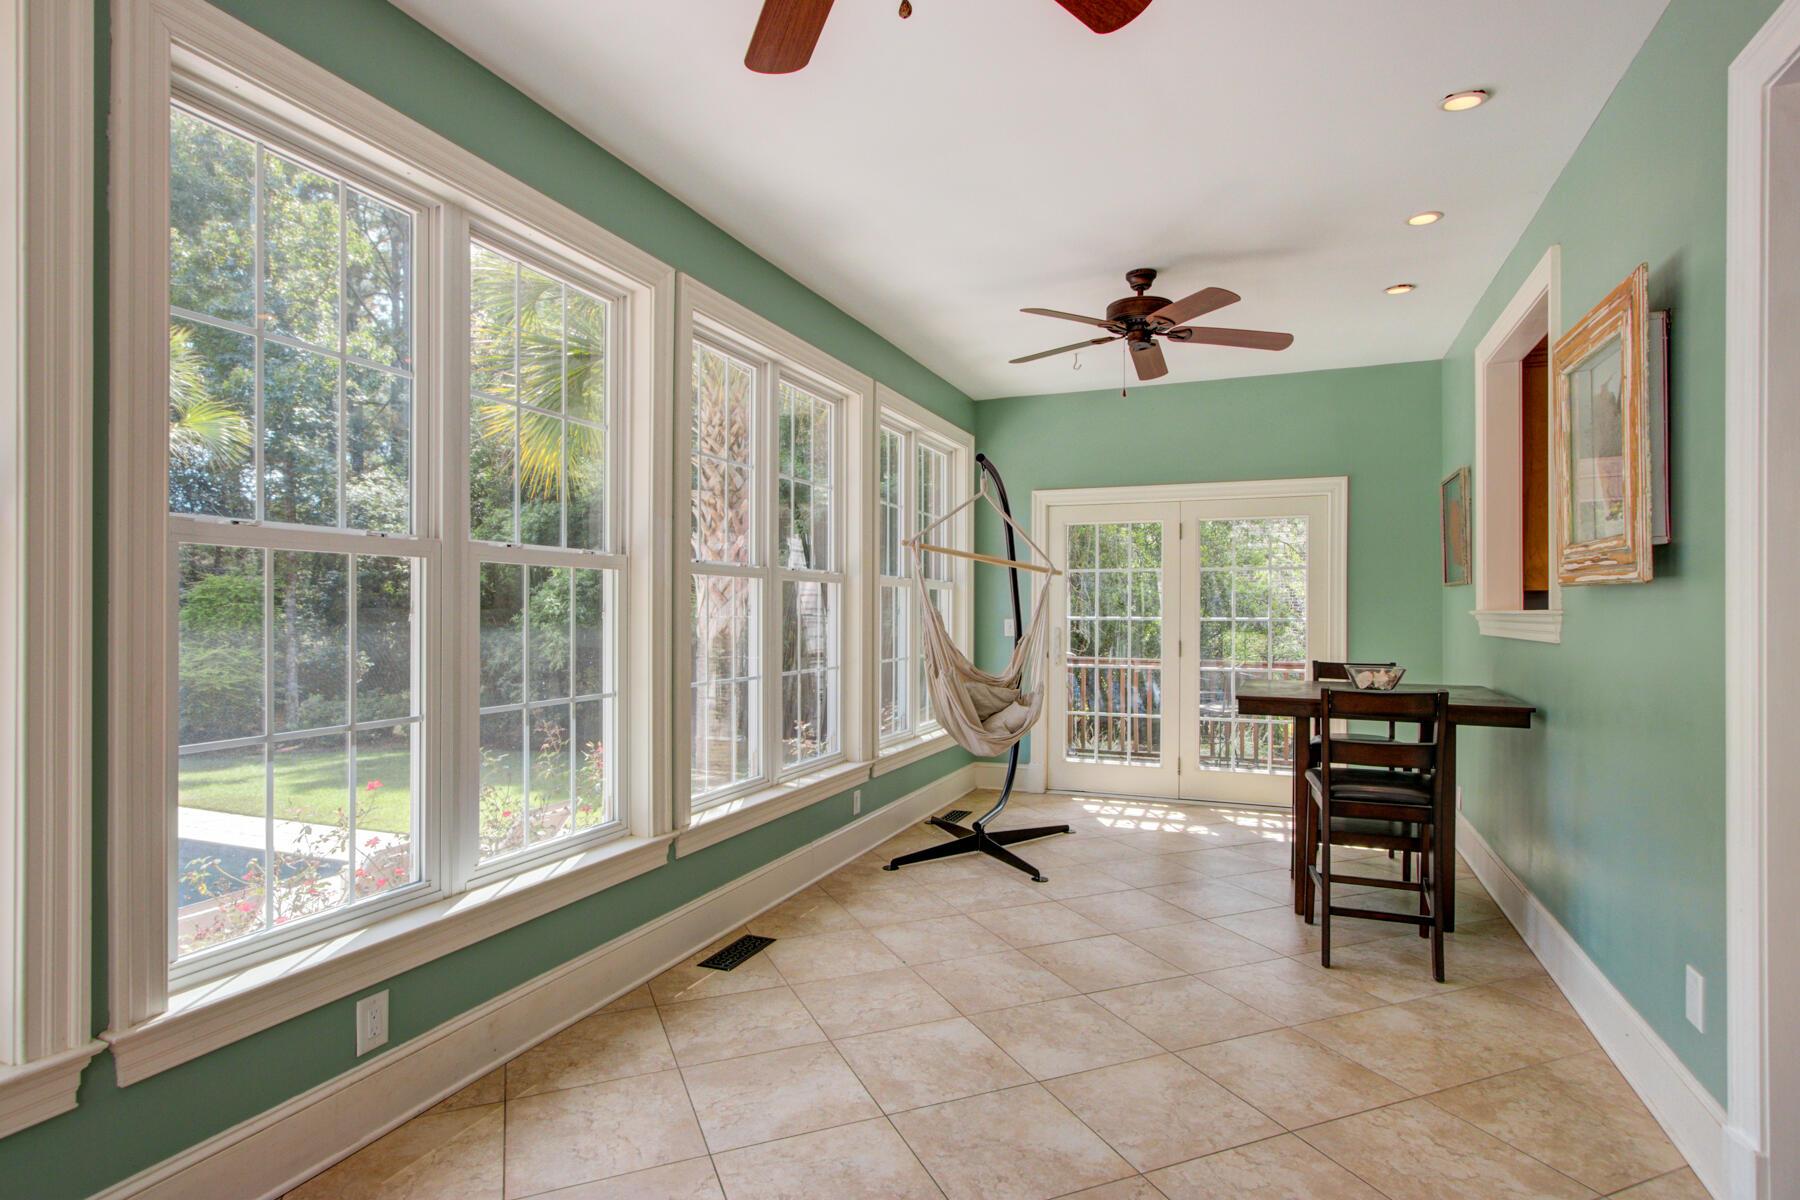 Dunes West Homes For Sale - 3095 Pignatelli, Mount Pleasant, SC - 44